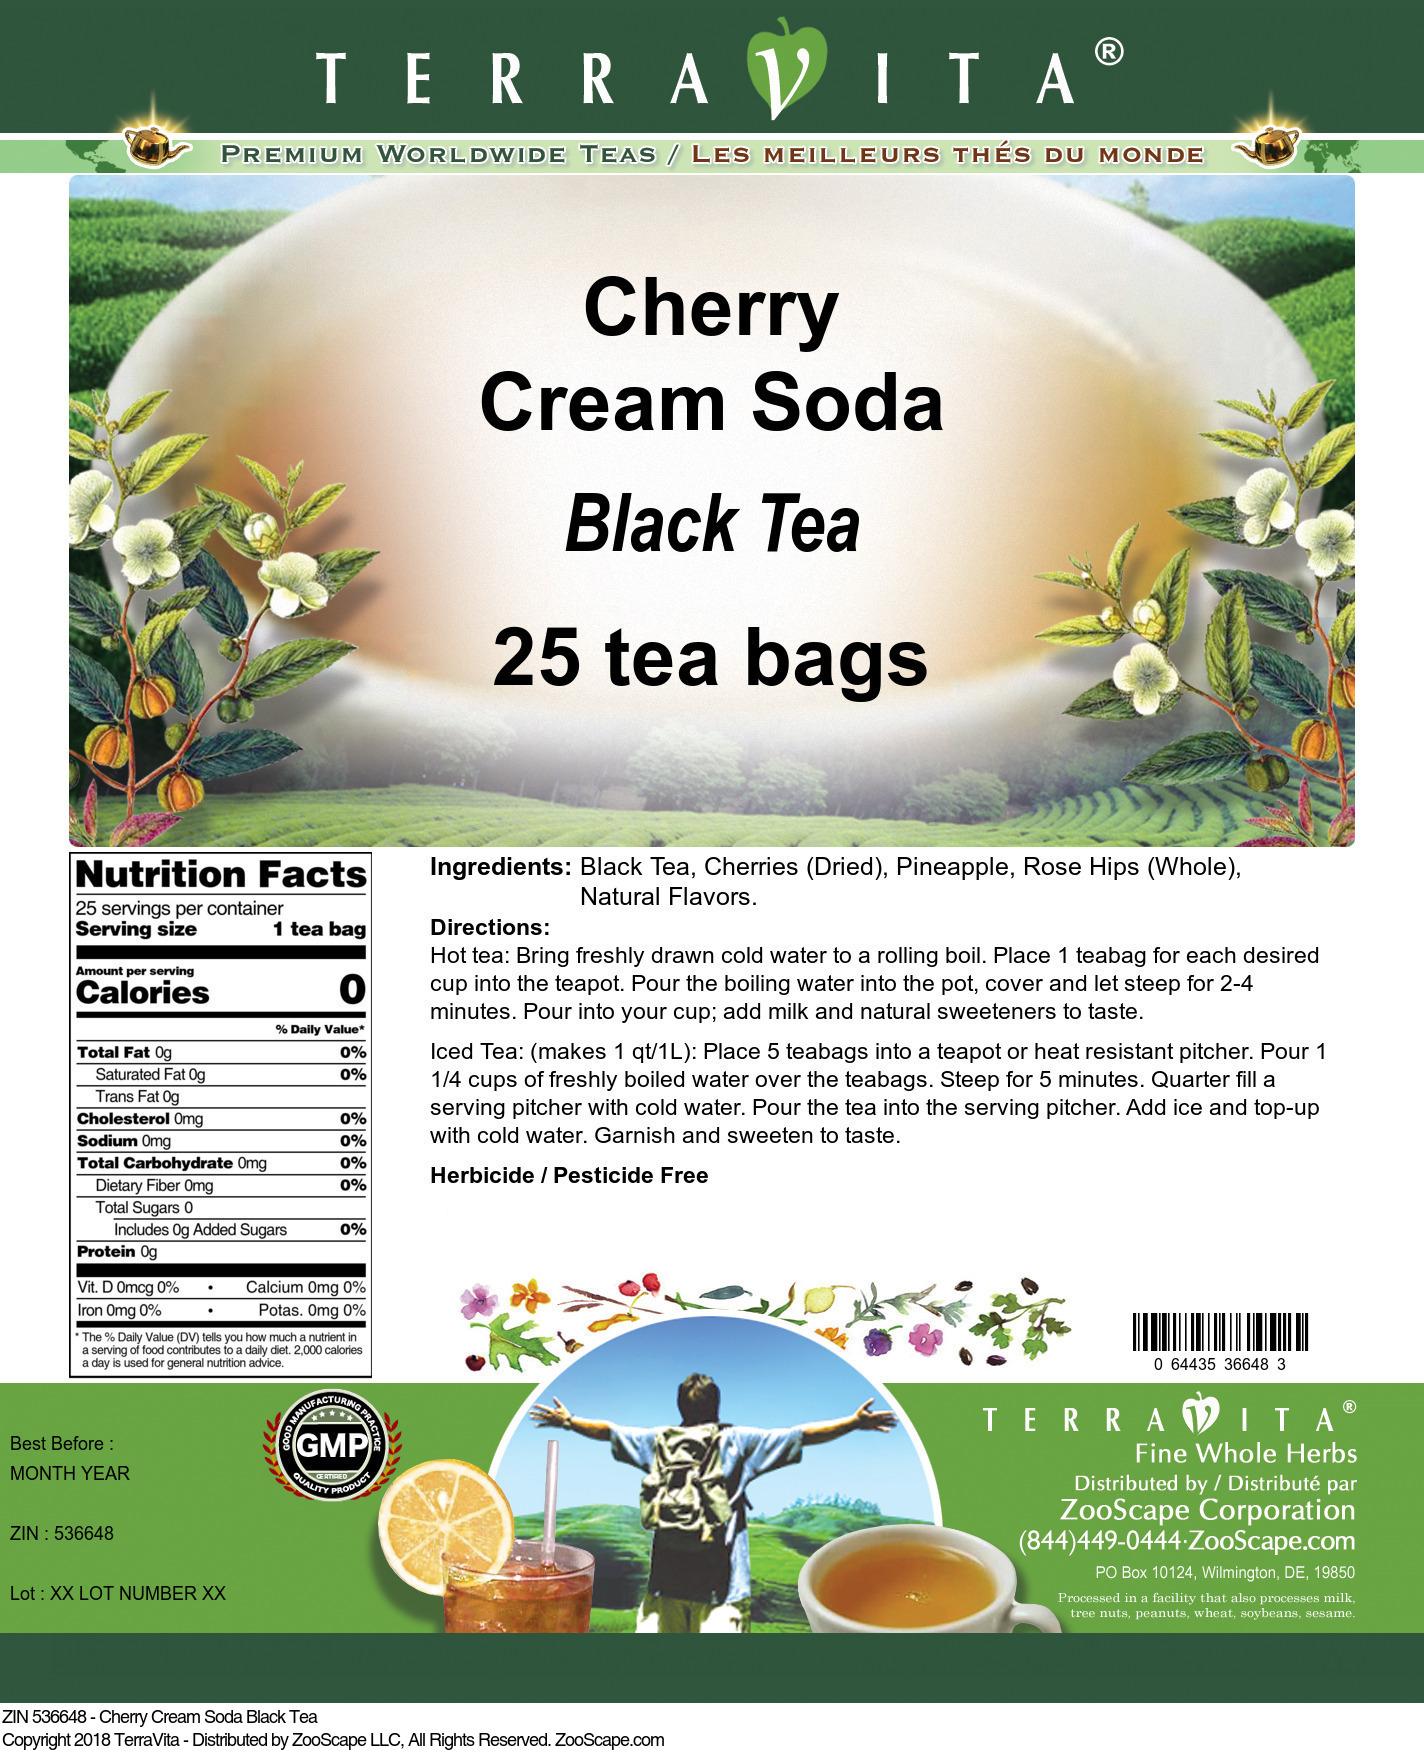 Cherry Cream Soda Black Tea